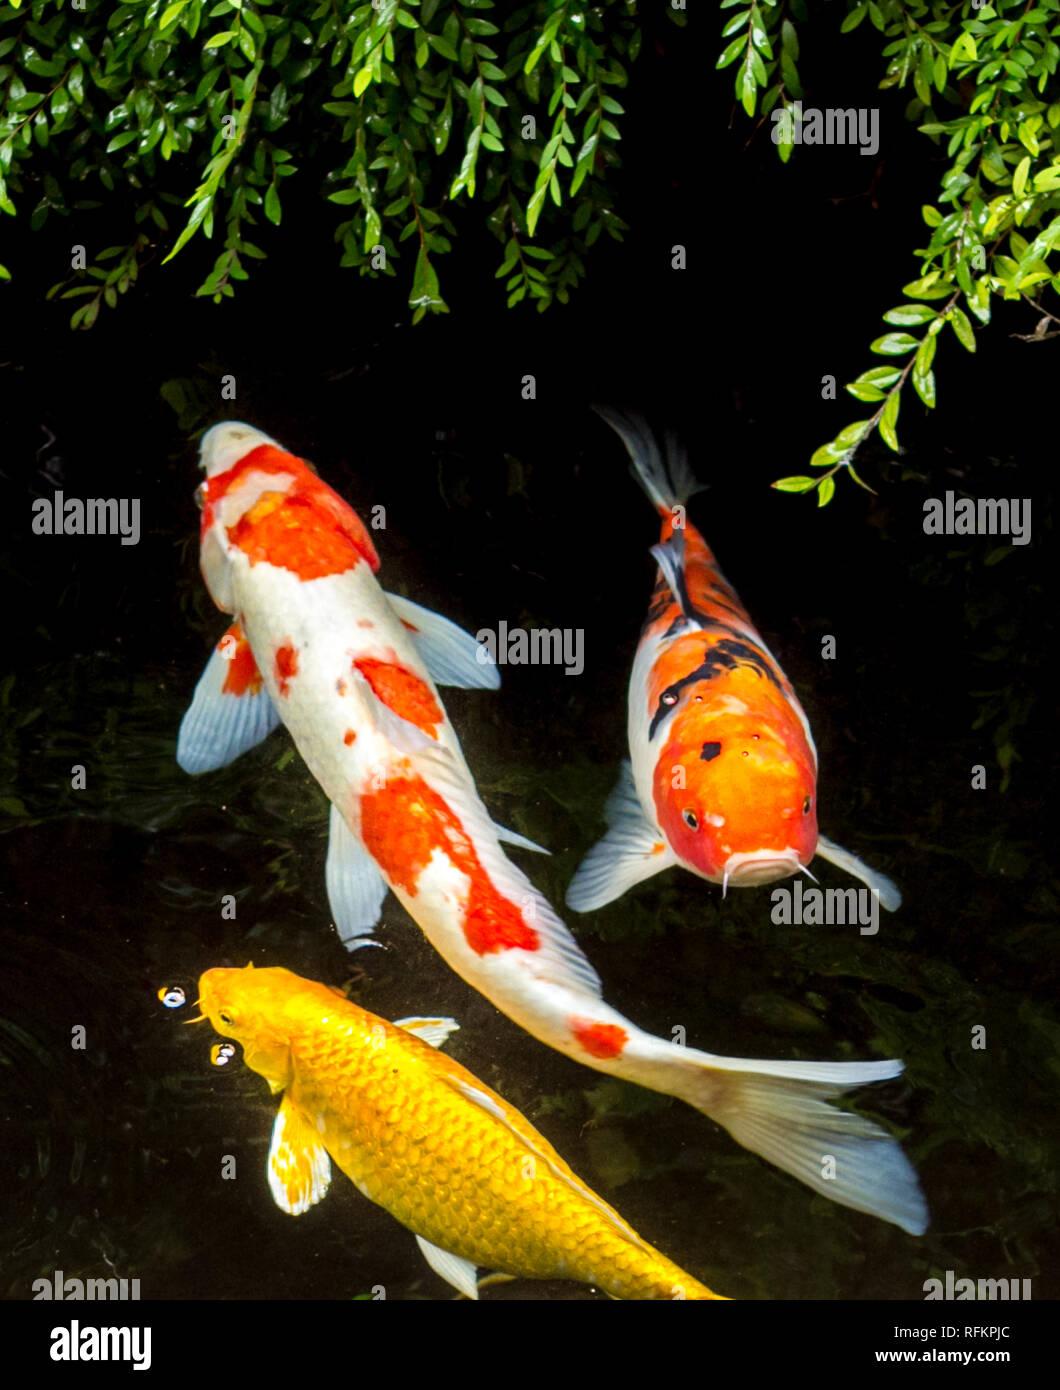 Koi Fish Pics : Colorful, Stock, Photo, Alamy